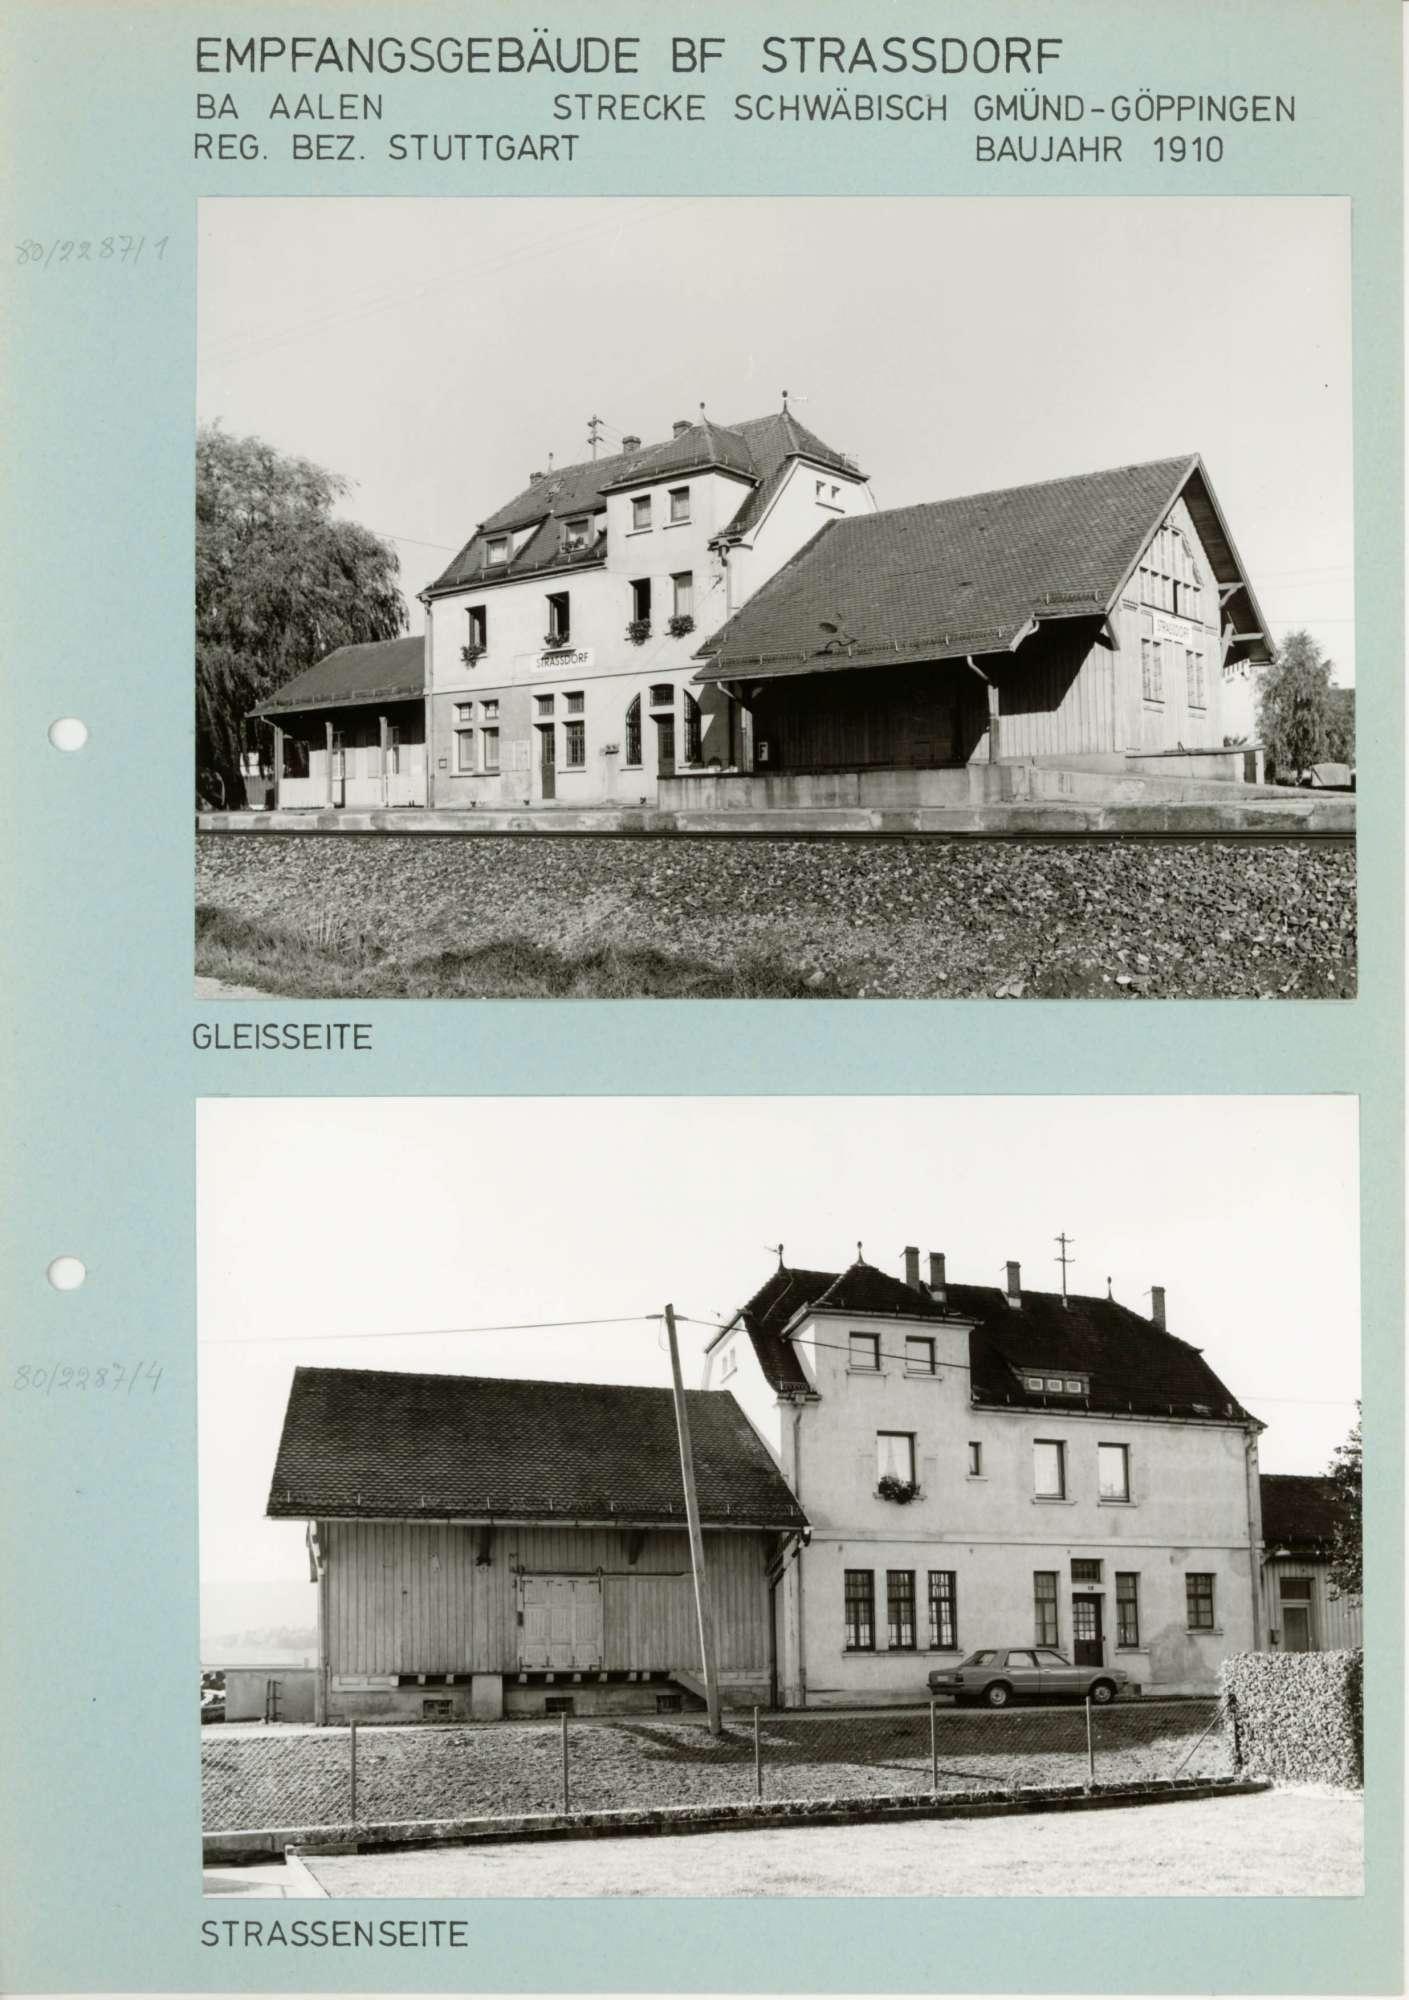 Straßdorf: 4 Fotos, Bild 2